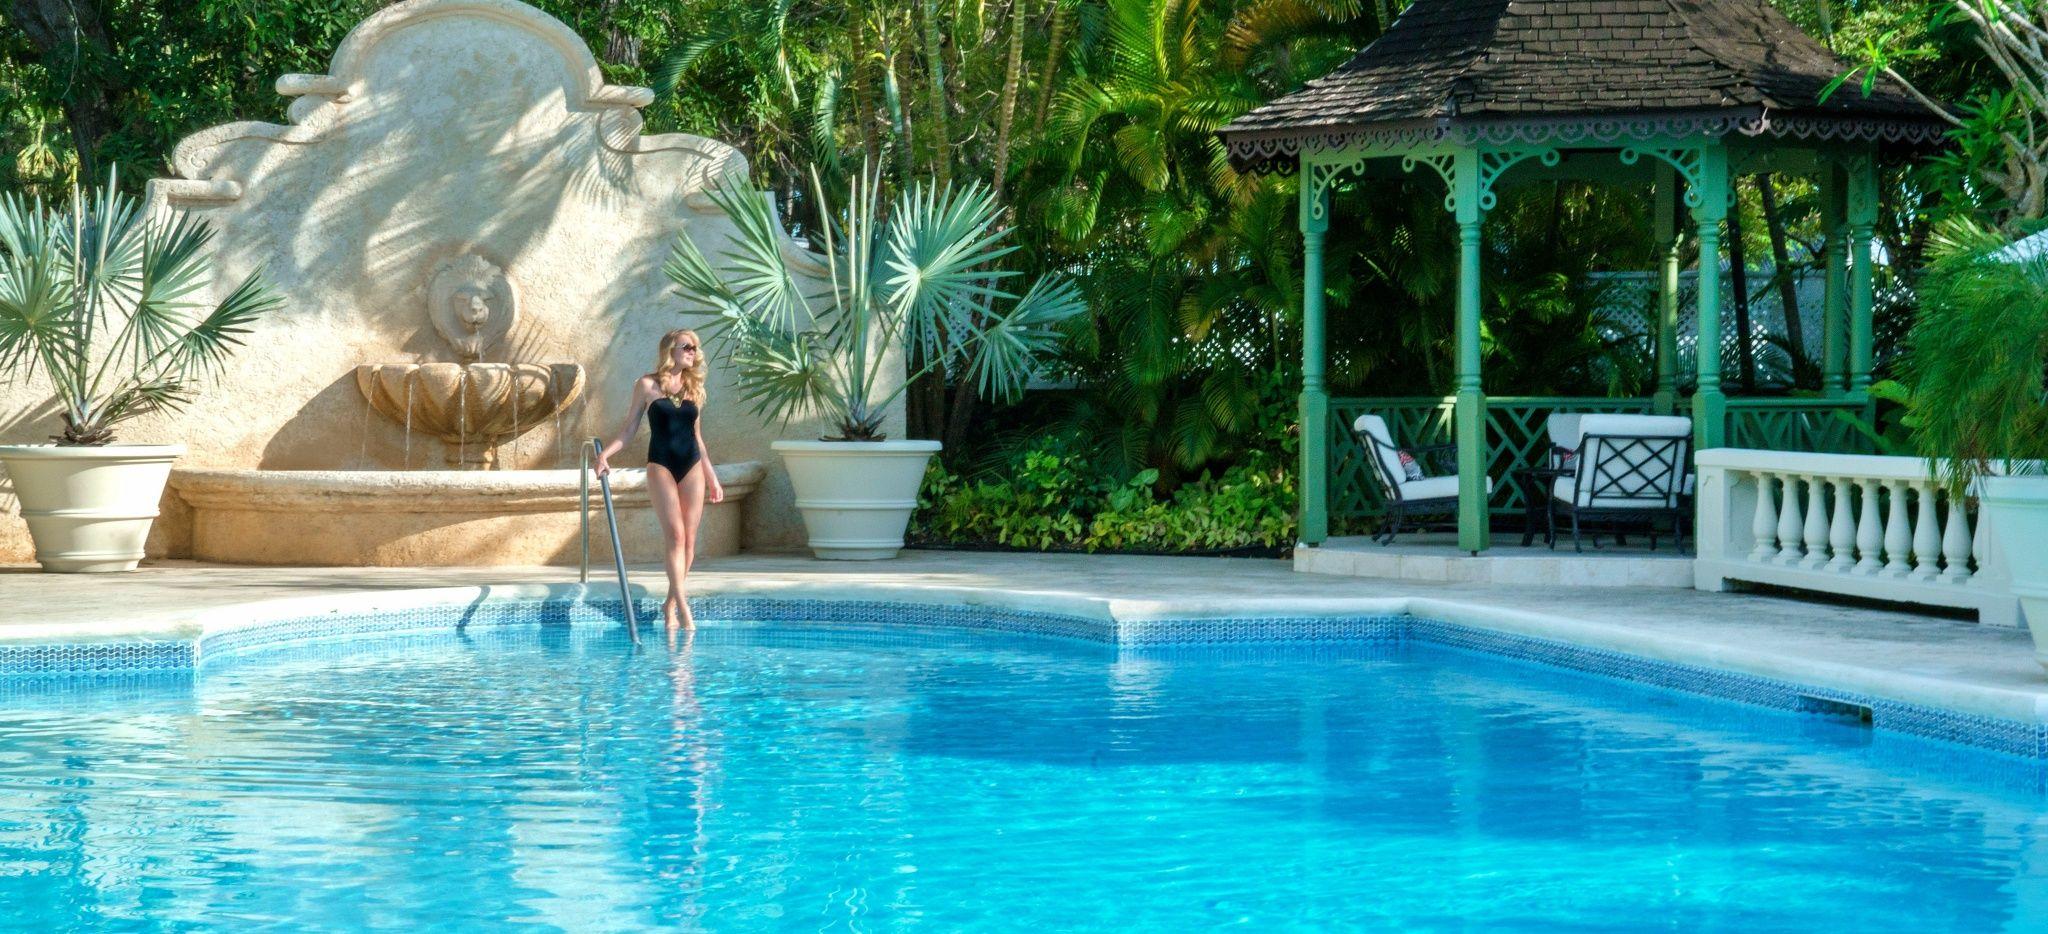 "Eine Frau steigt in den Hauptpool des Hotels ""Coral Reef Club Barbados"""